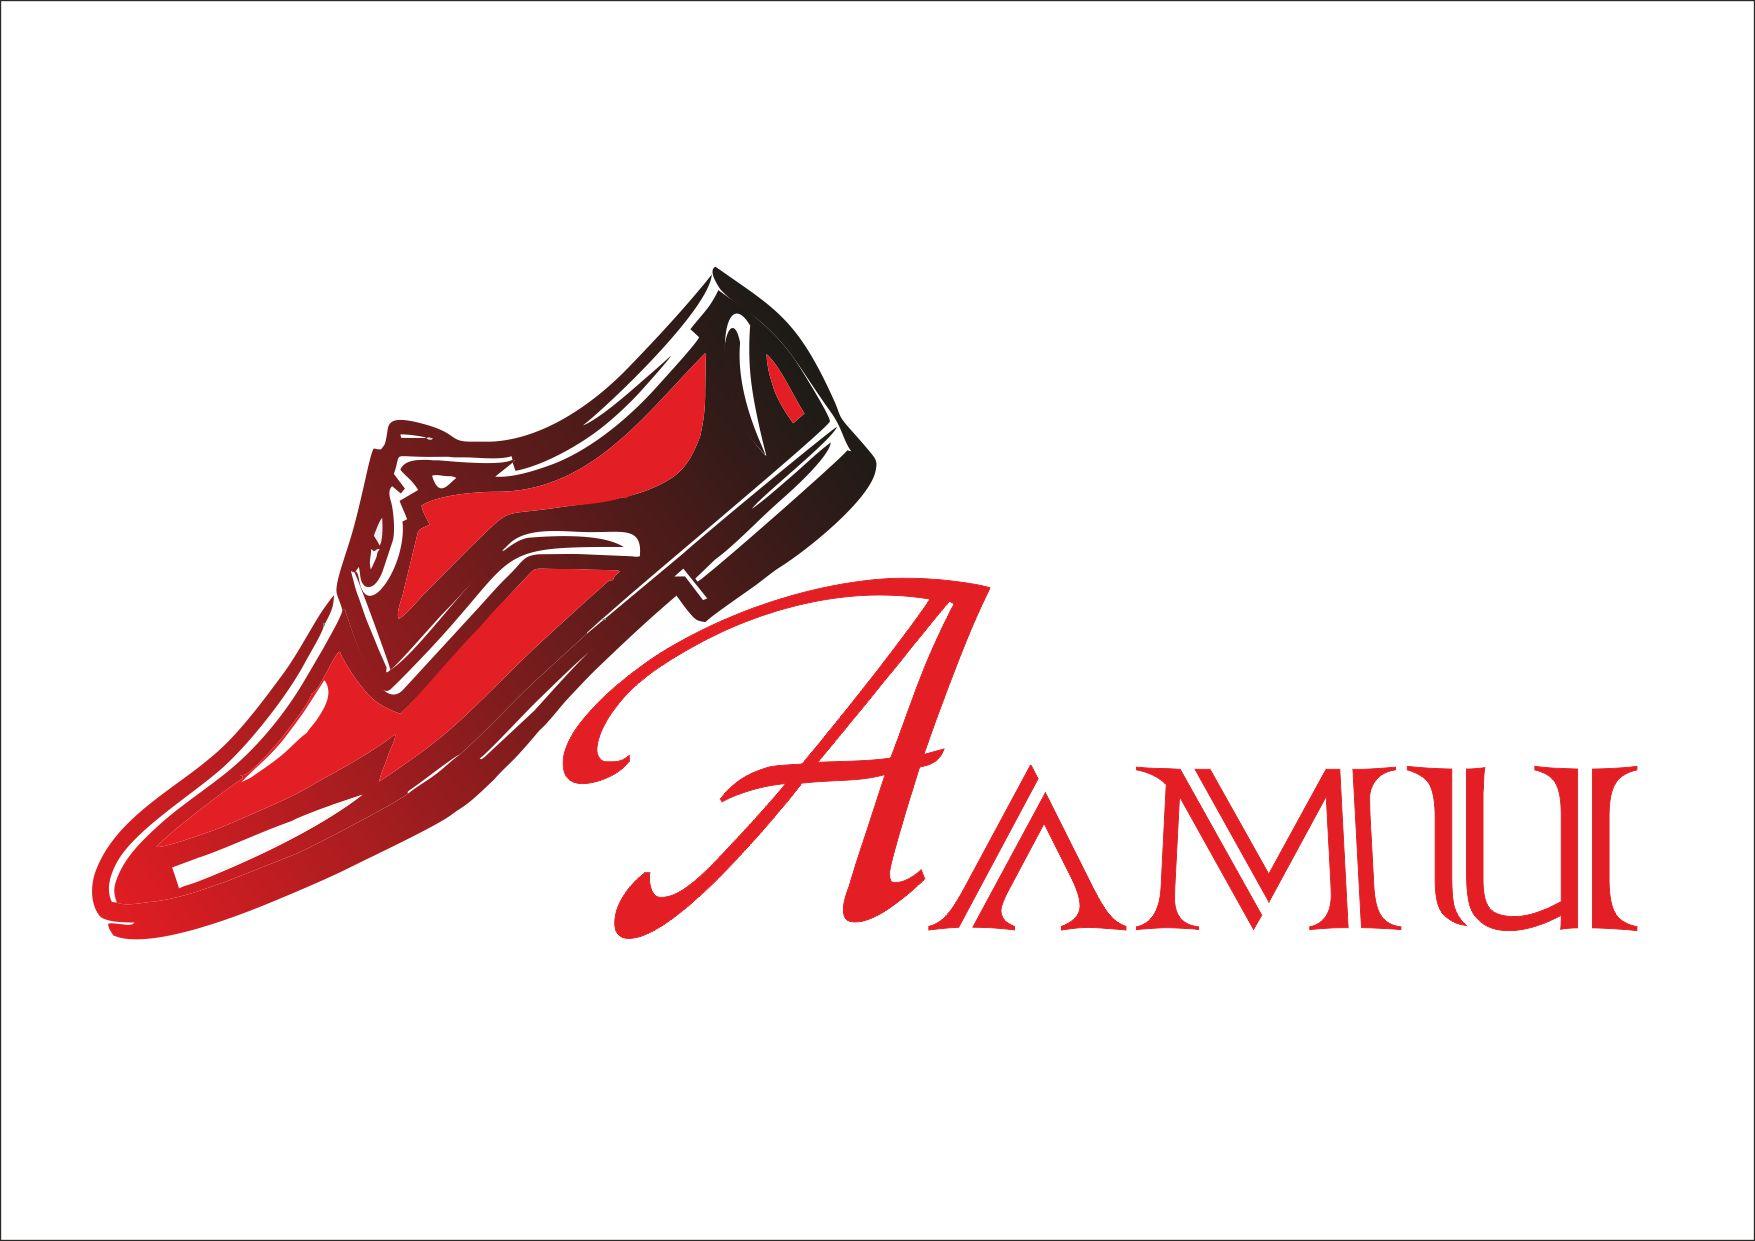 Дизайн логотипа обувной марки Алми фото f_25359d99a4662fc8.jpg